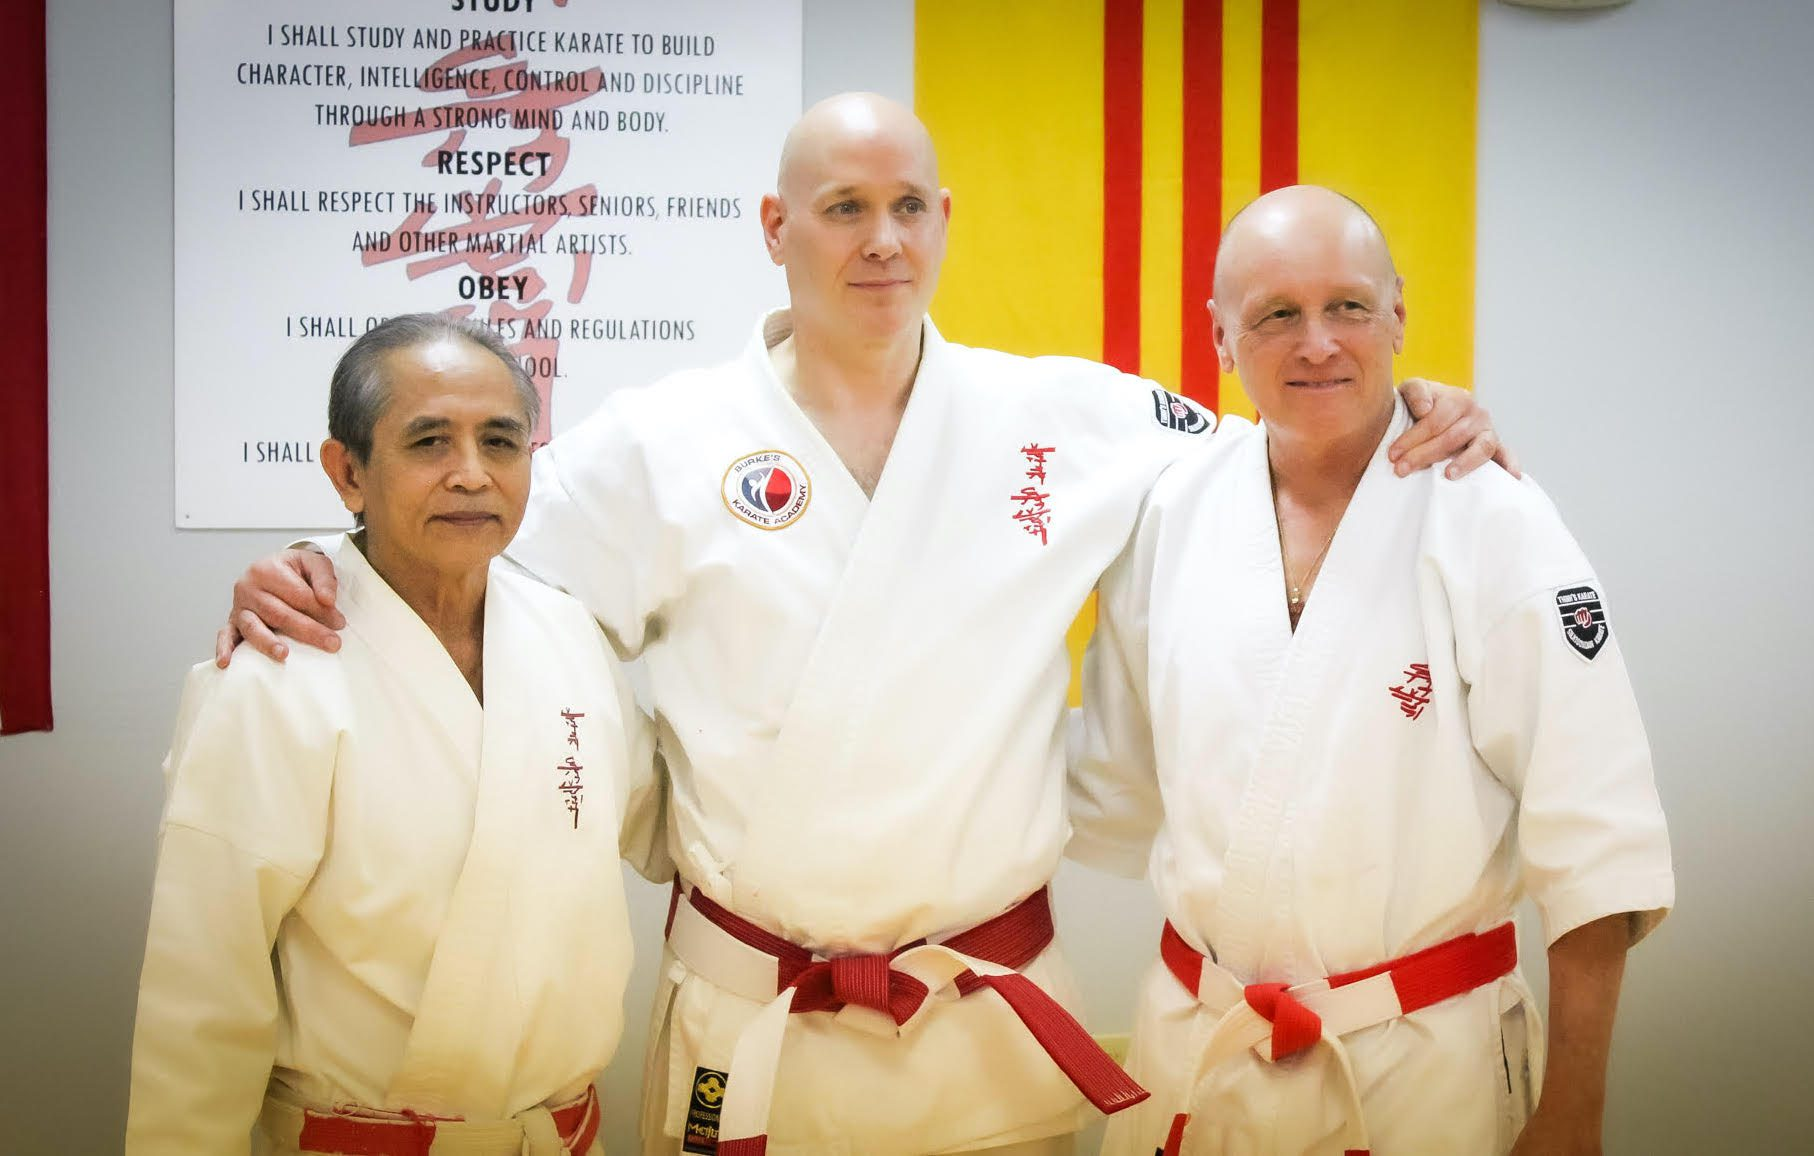 Burke's Karate members pose for a photo